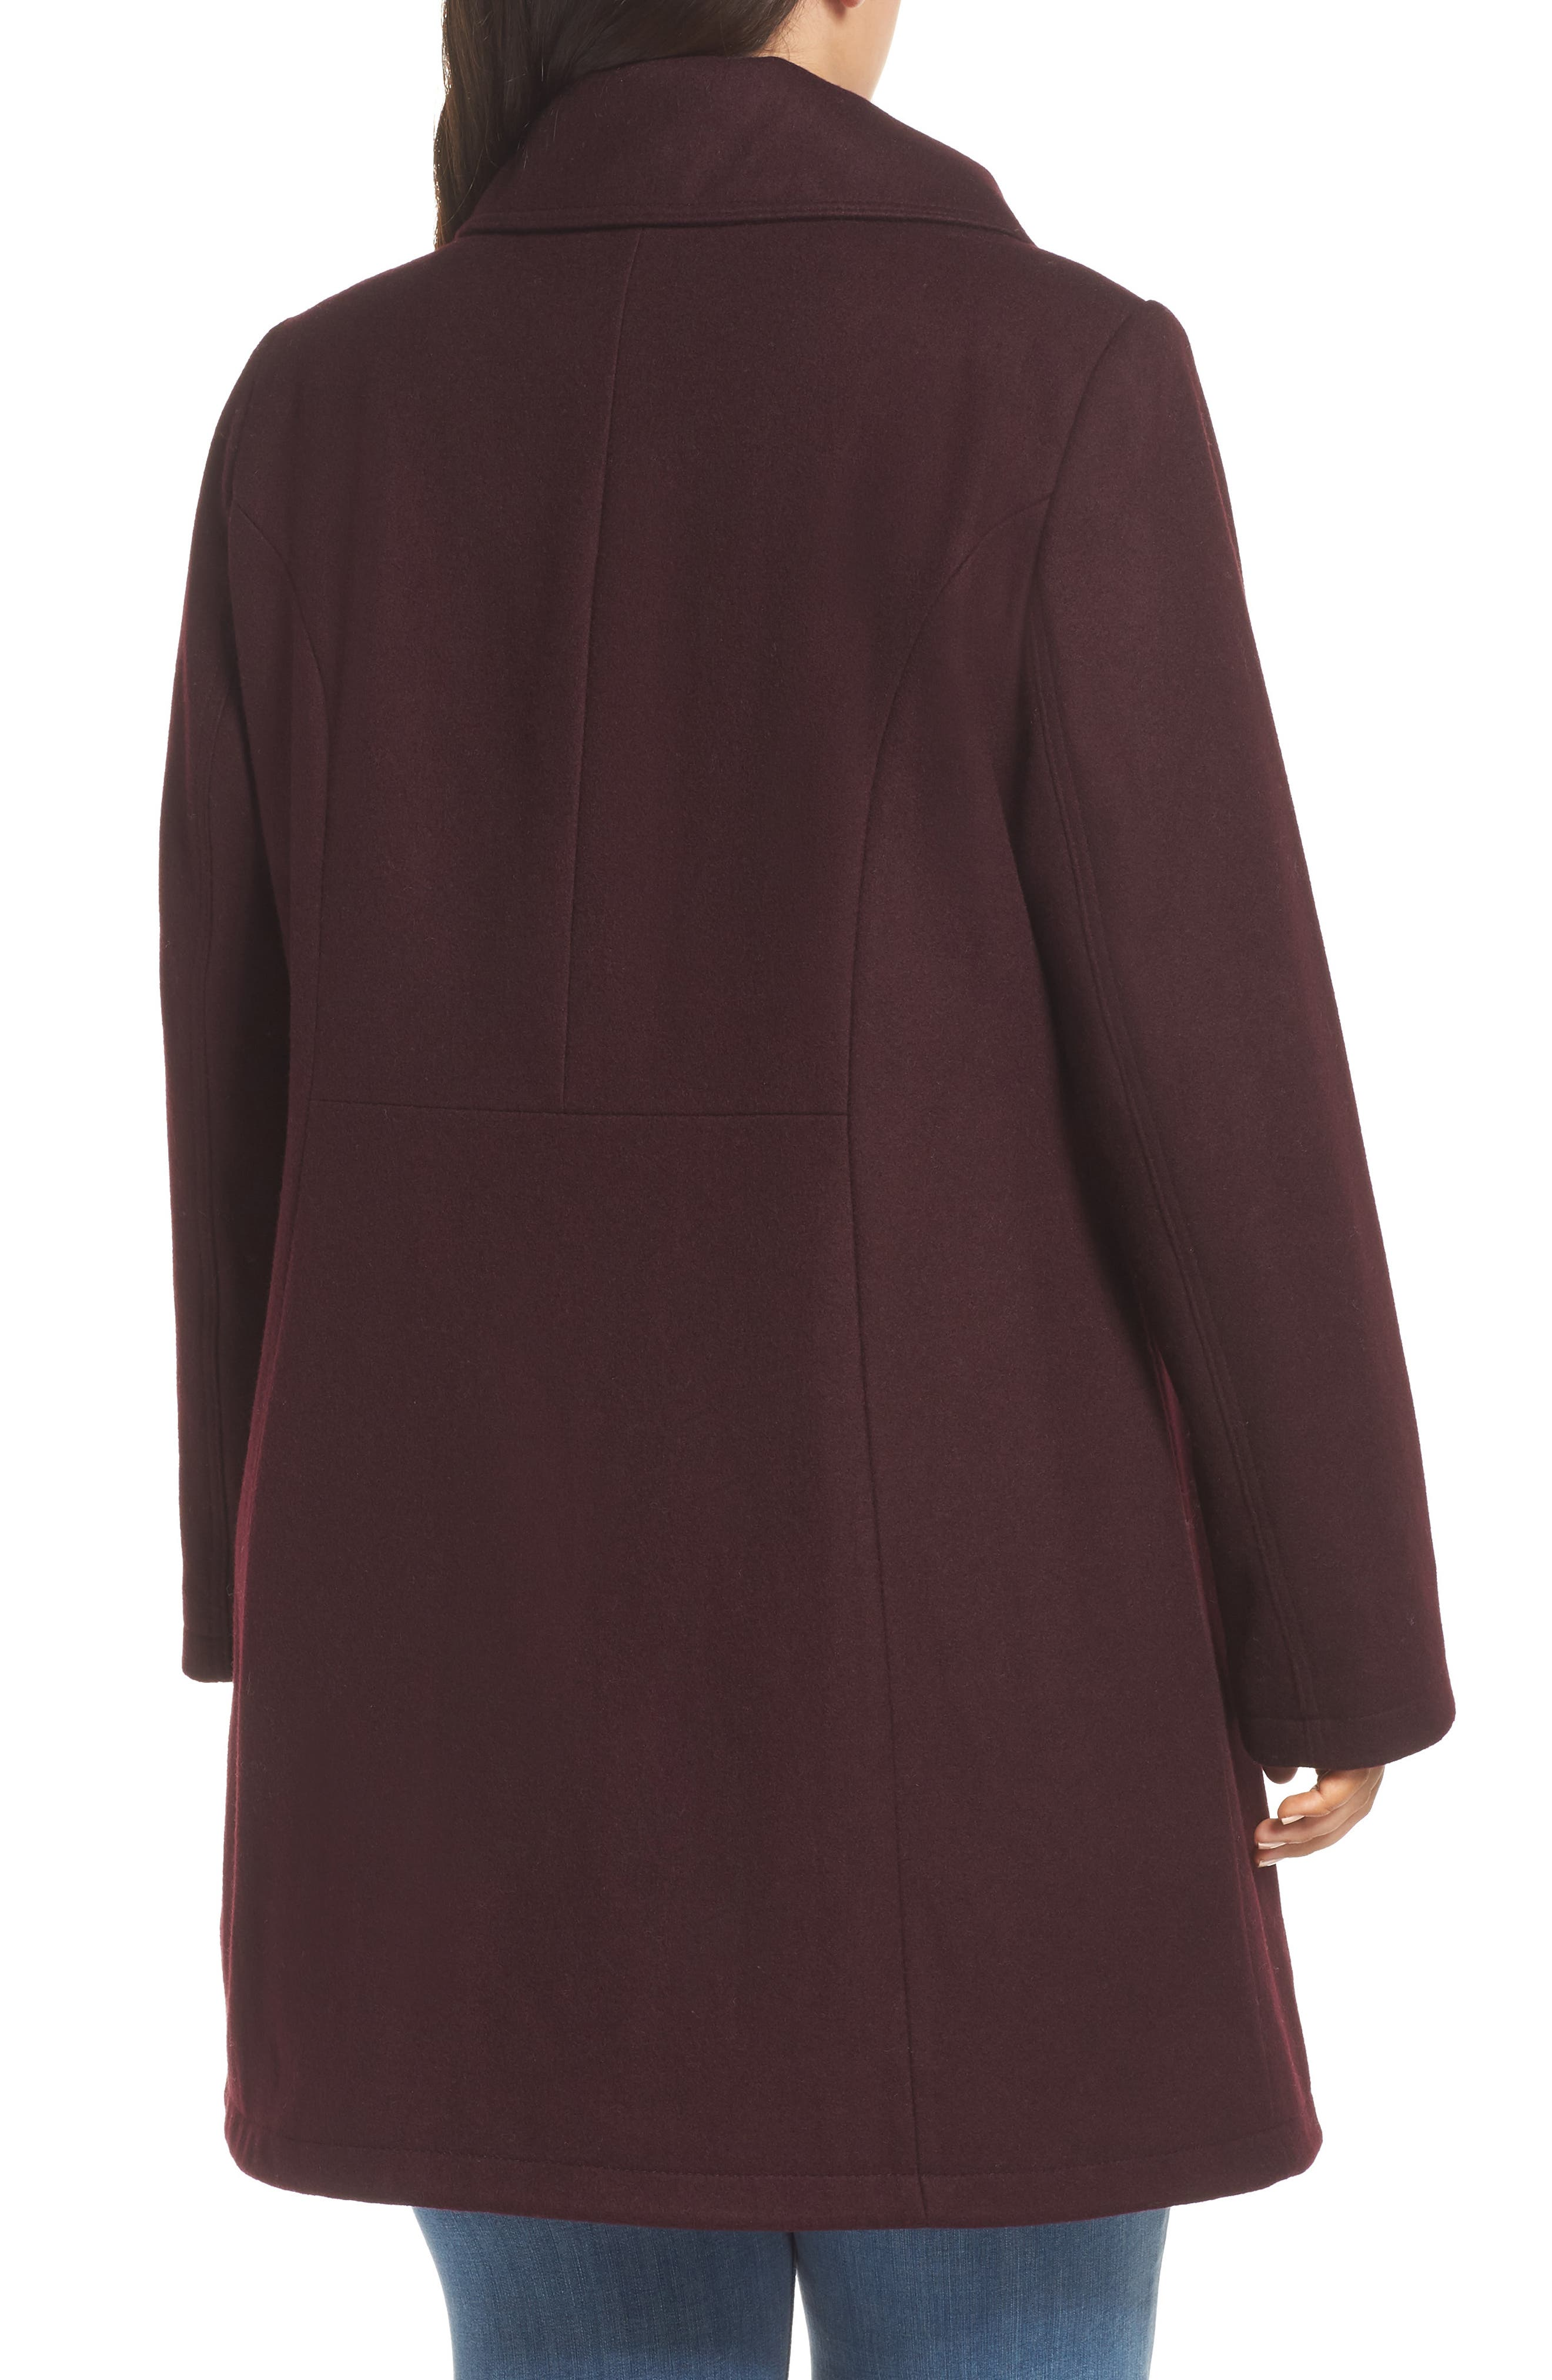 Asymmetrical Zip Wool Blend Coat,                             Alternate thumbnail 2, color,                             WINE